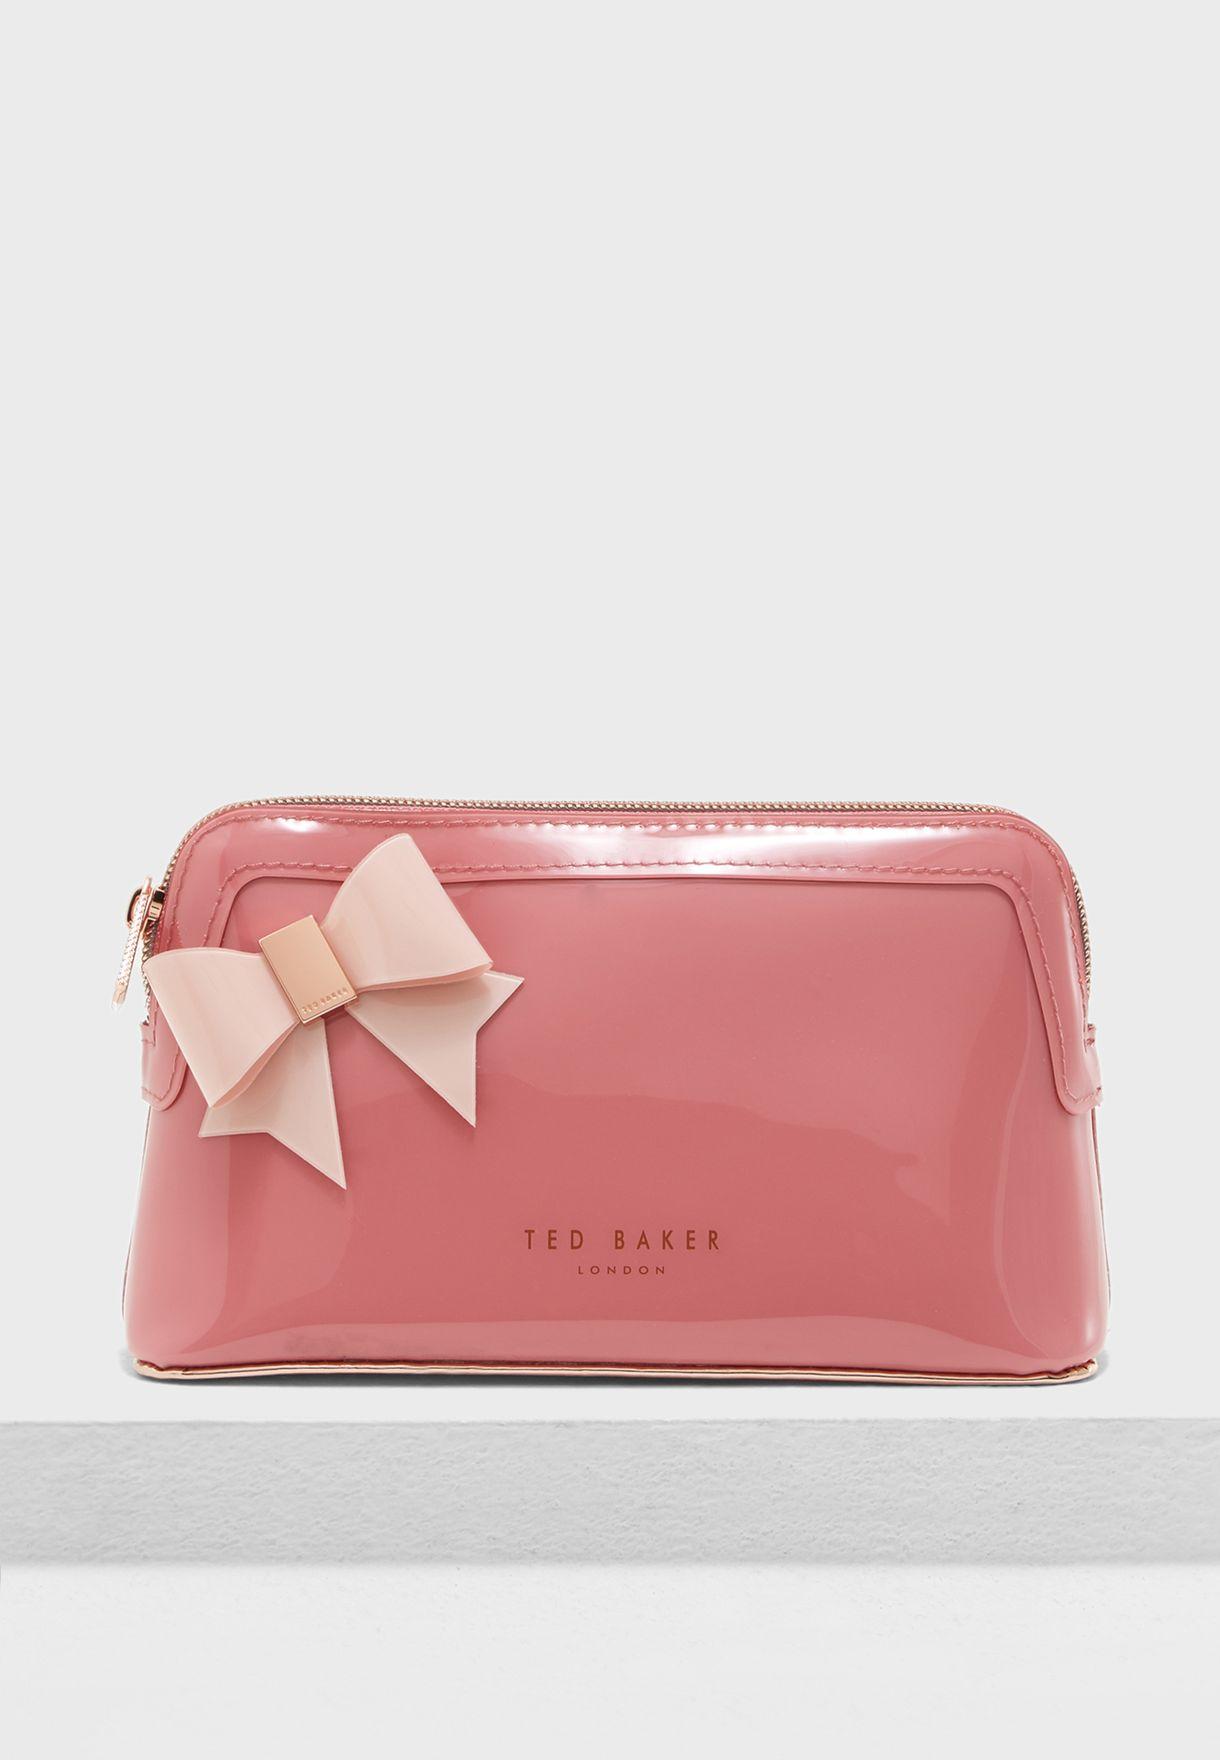 8658bda645 Shop Ted baker pink Ixoriaa Bow Makeup Bag 150029 for Women in Qatar ...